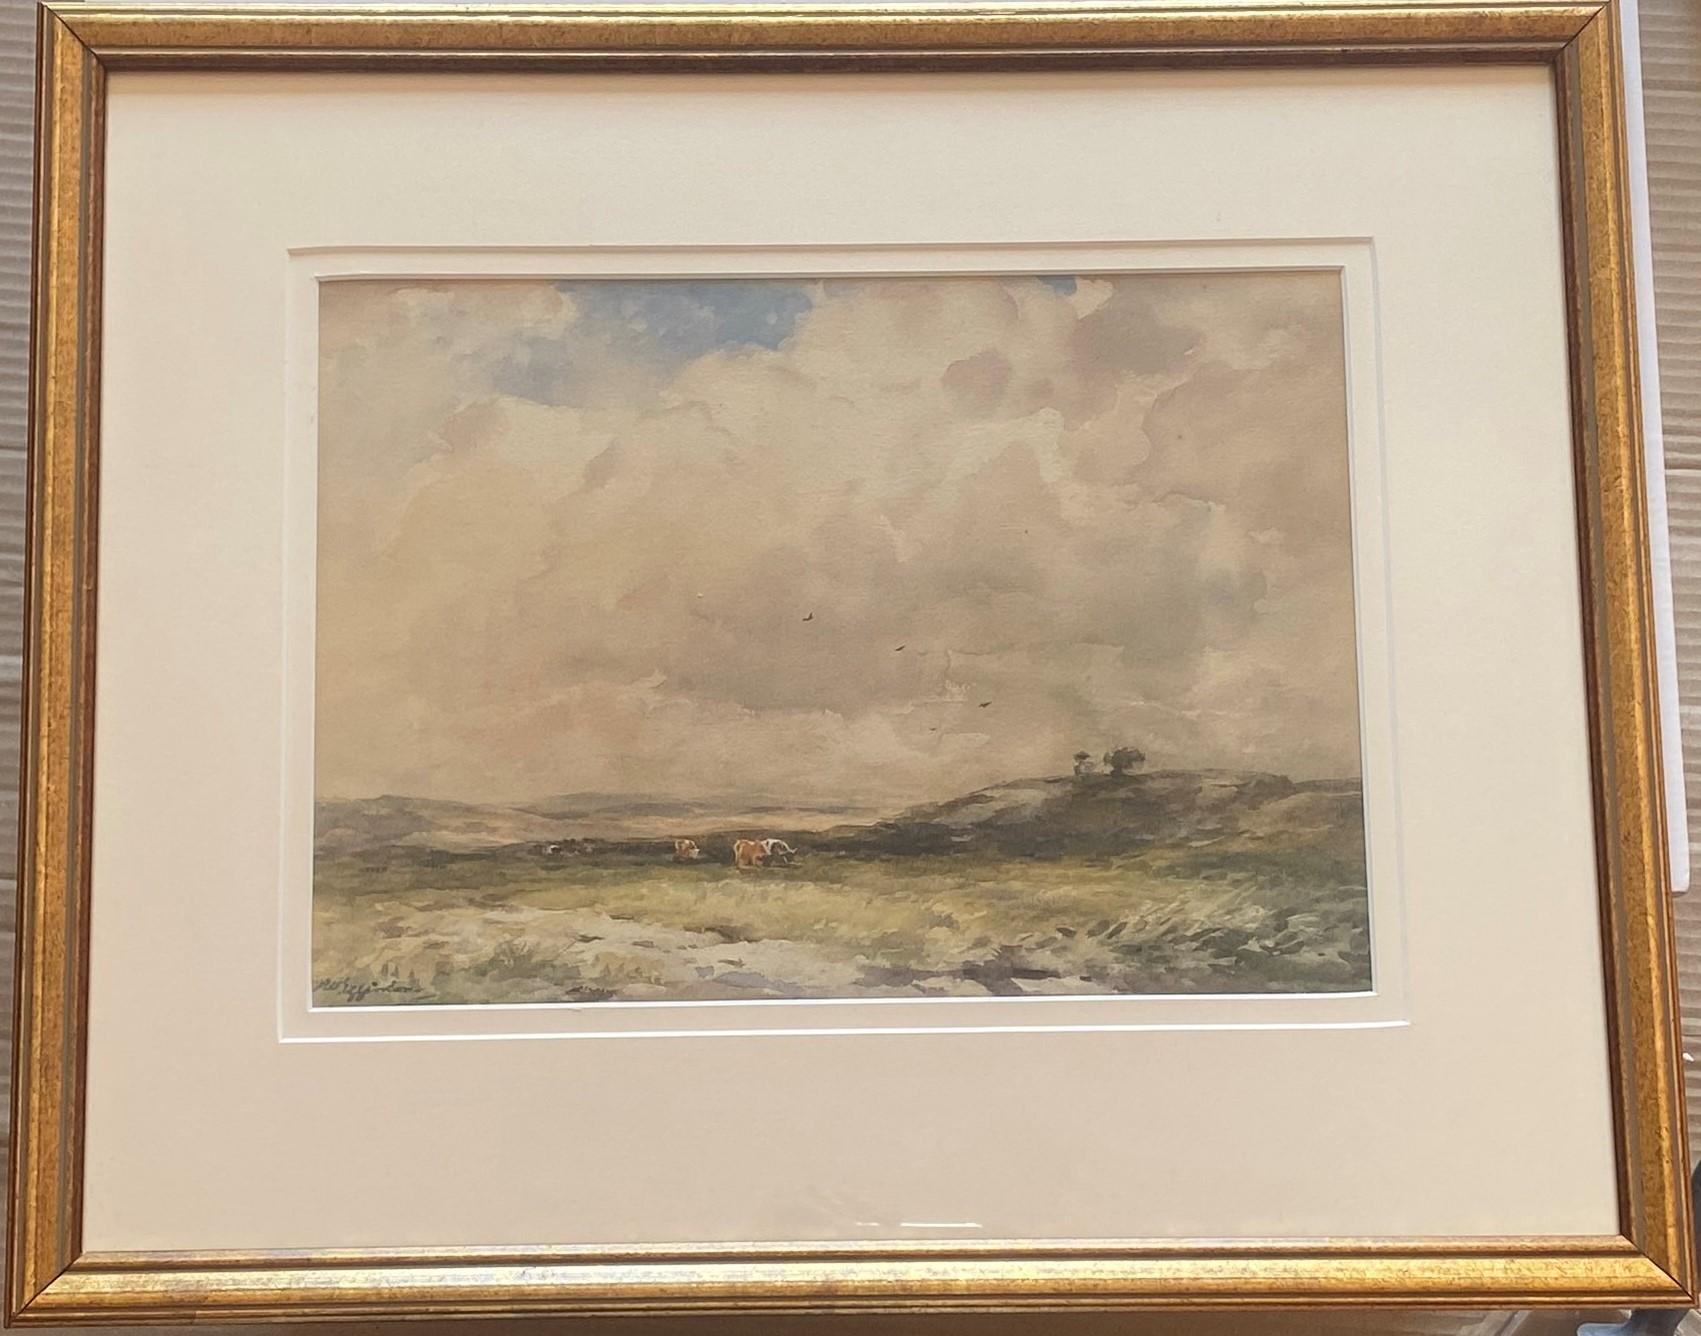 Lot 50 - Original Signed Watercolour. Wycliffe Eggington, 1875-1951 - Grazing On The Moor